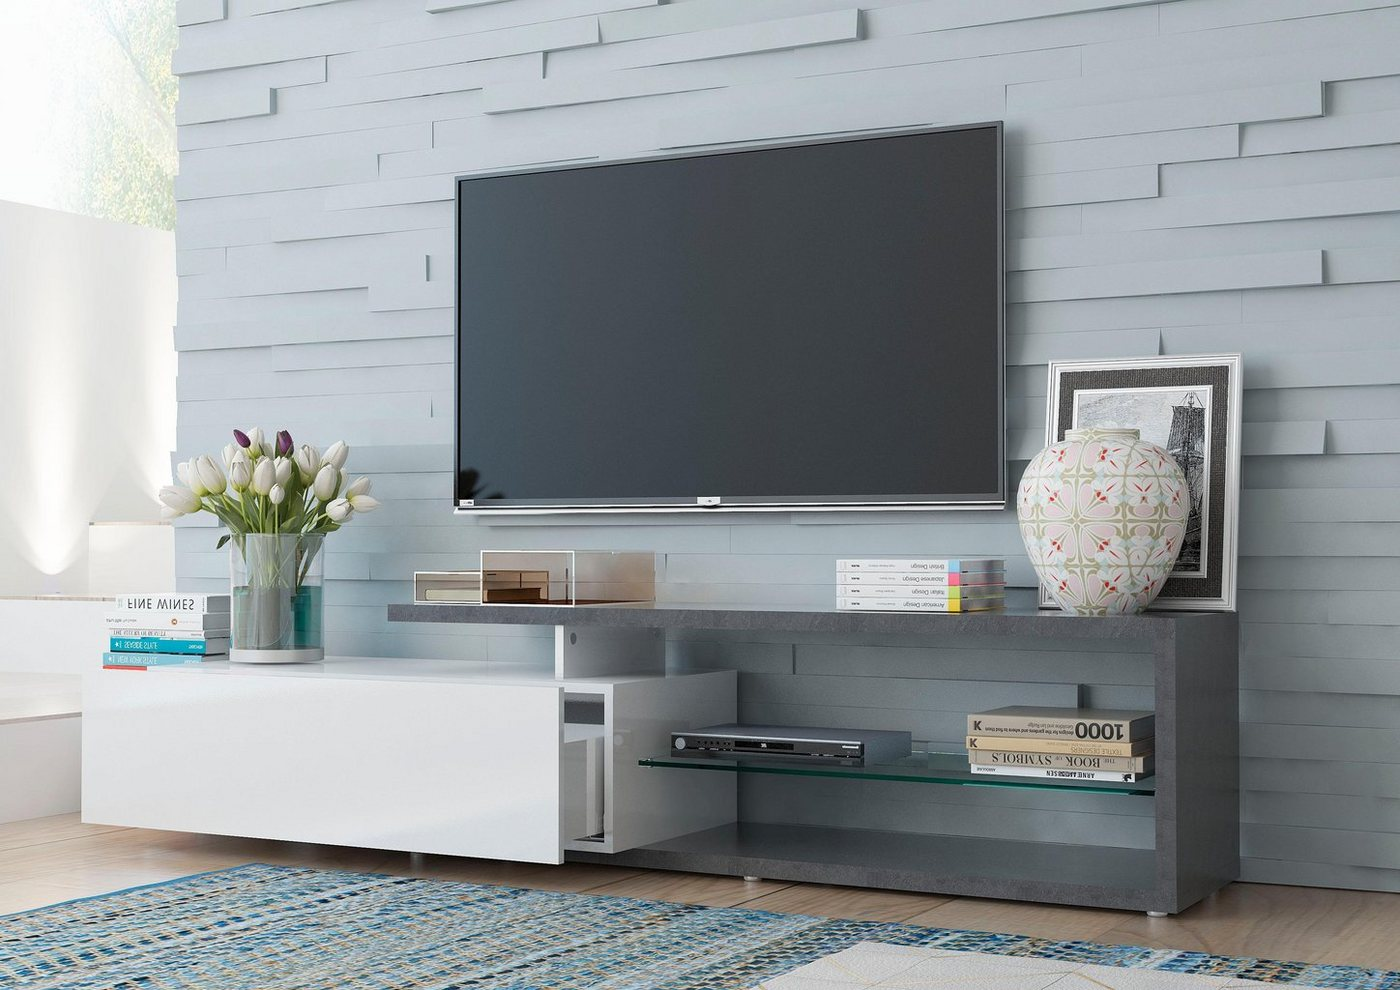 Tecnos TV-meubel Treviso, breedte 190 cm